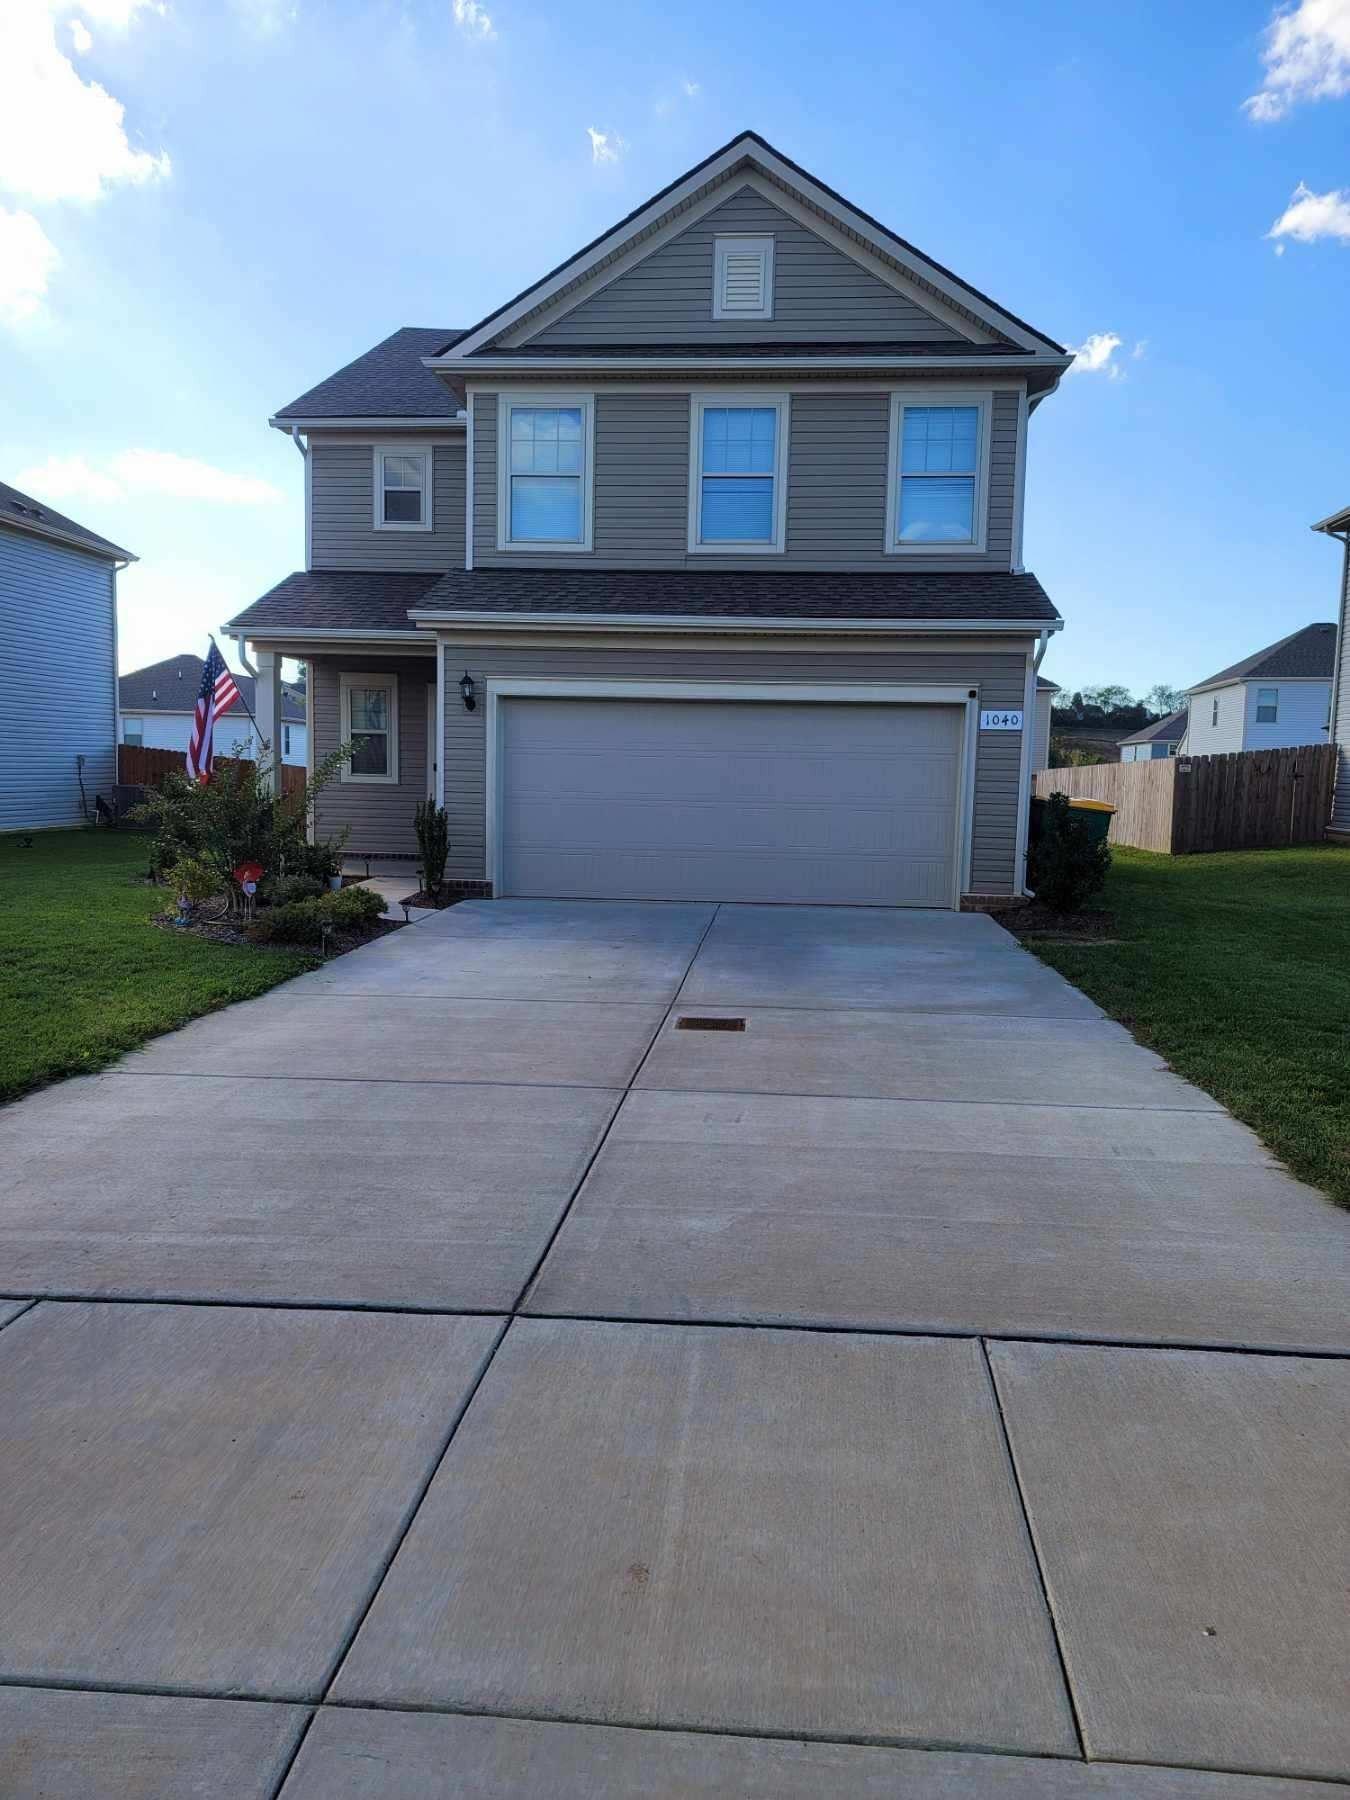 Photo of 1040 Lonergan Cir, Spring Hill, TN 37174 (MLS # 2299828)